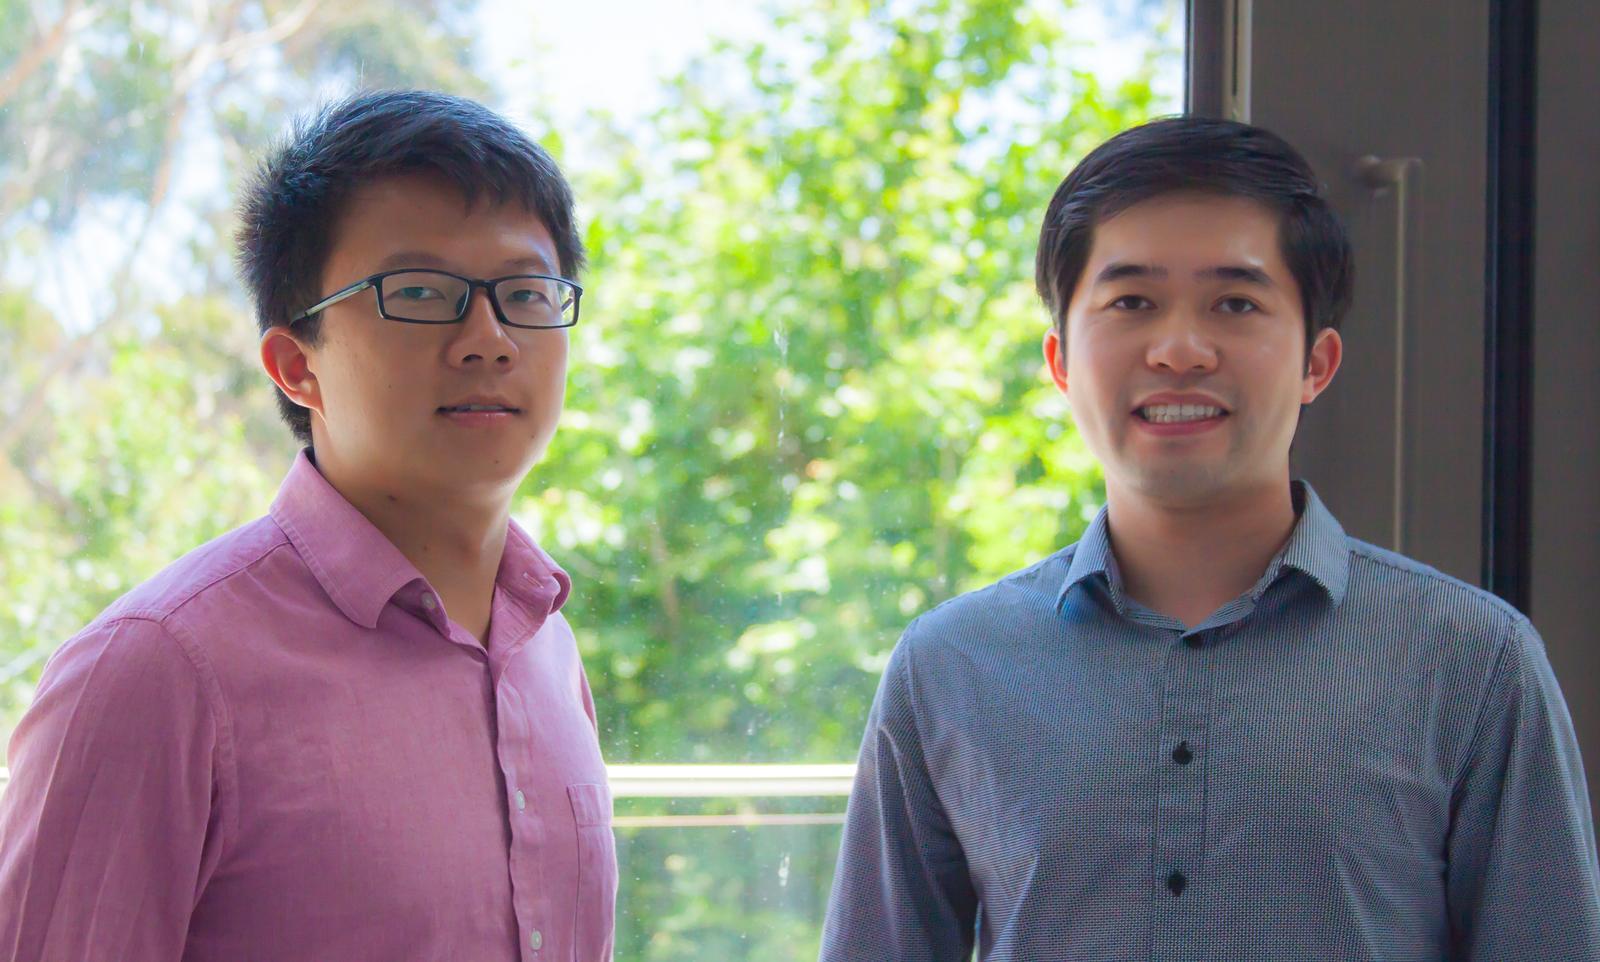 Jinxing Li (vlevo) a Wei Zhu. Kredit: UC San Diego